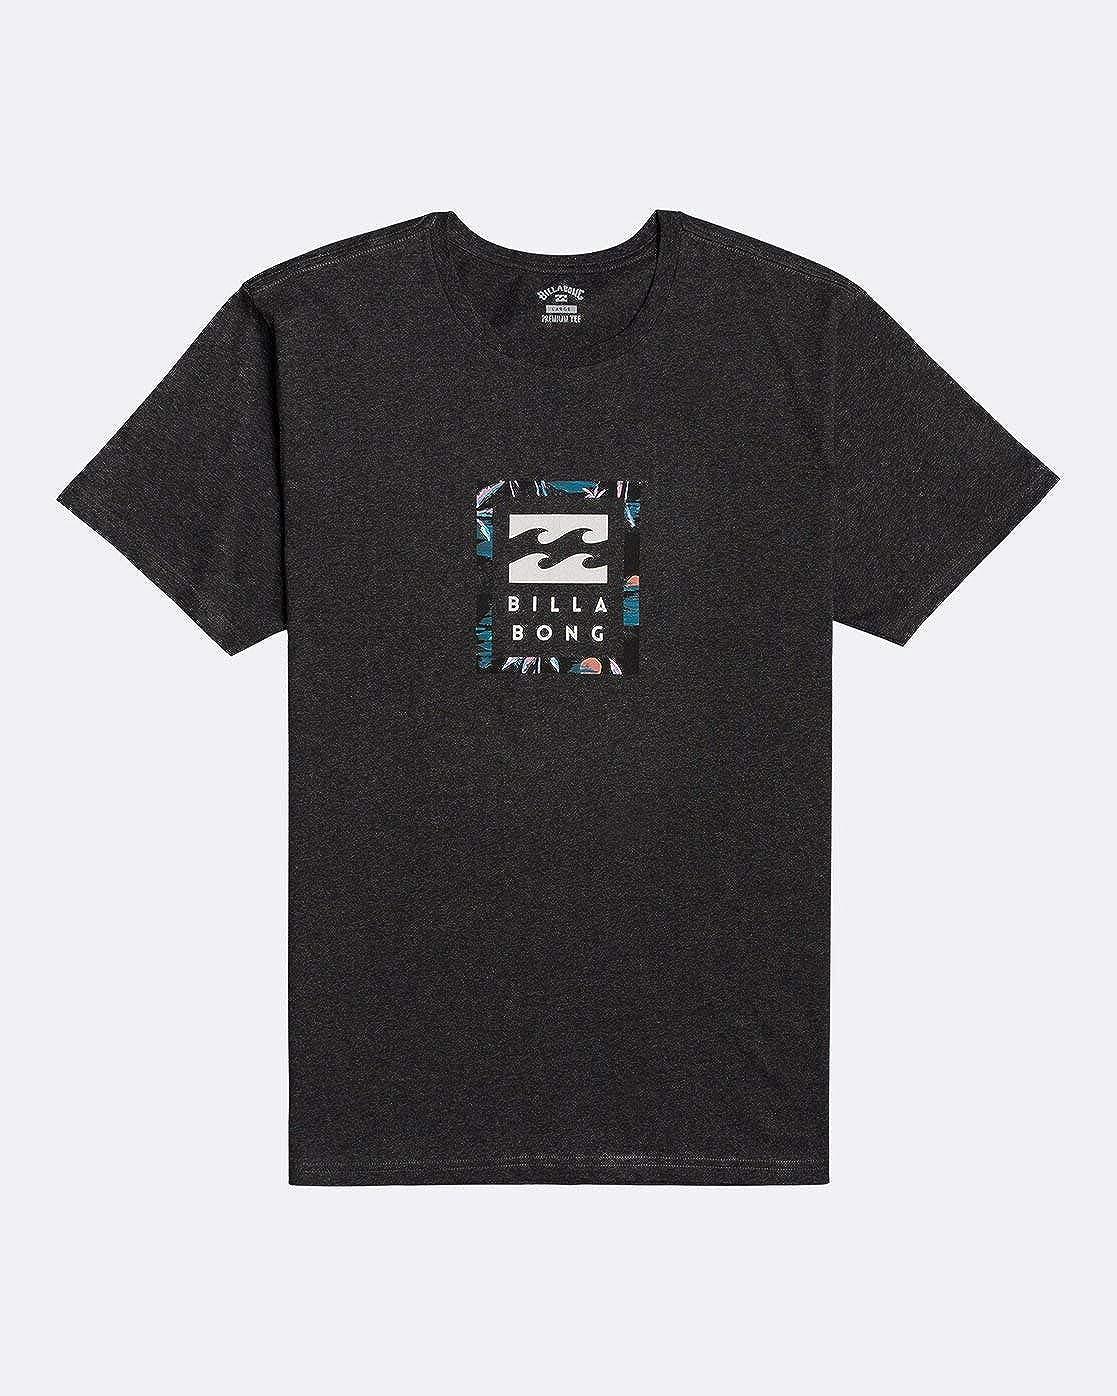 BILLABONG Unity Stacked - Camiseta para Hombre Camiseta Hombre